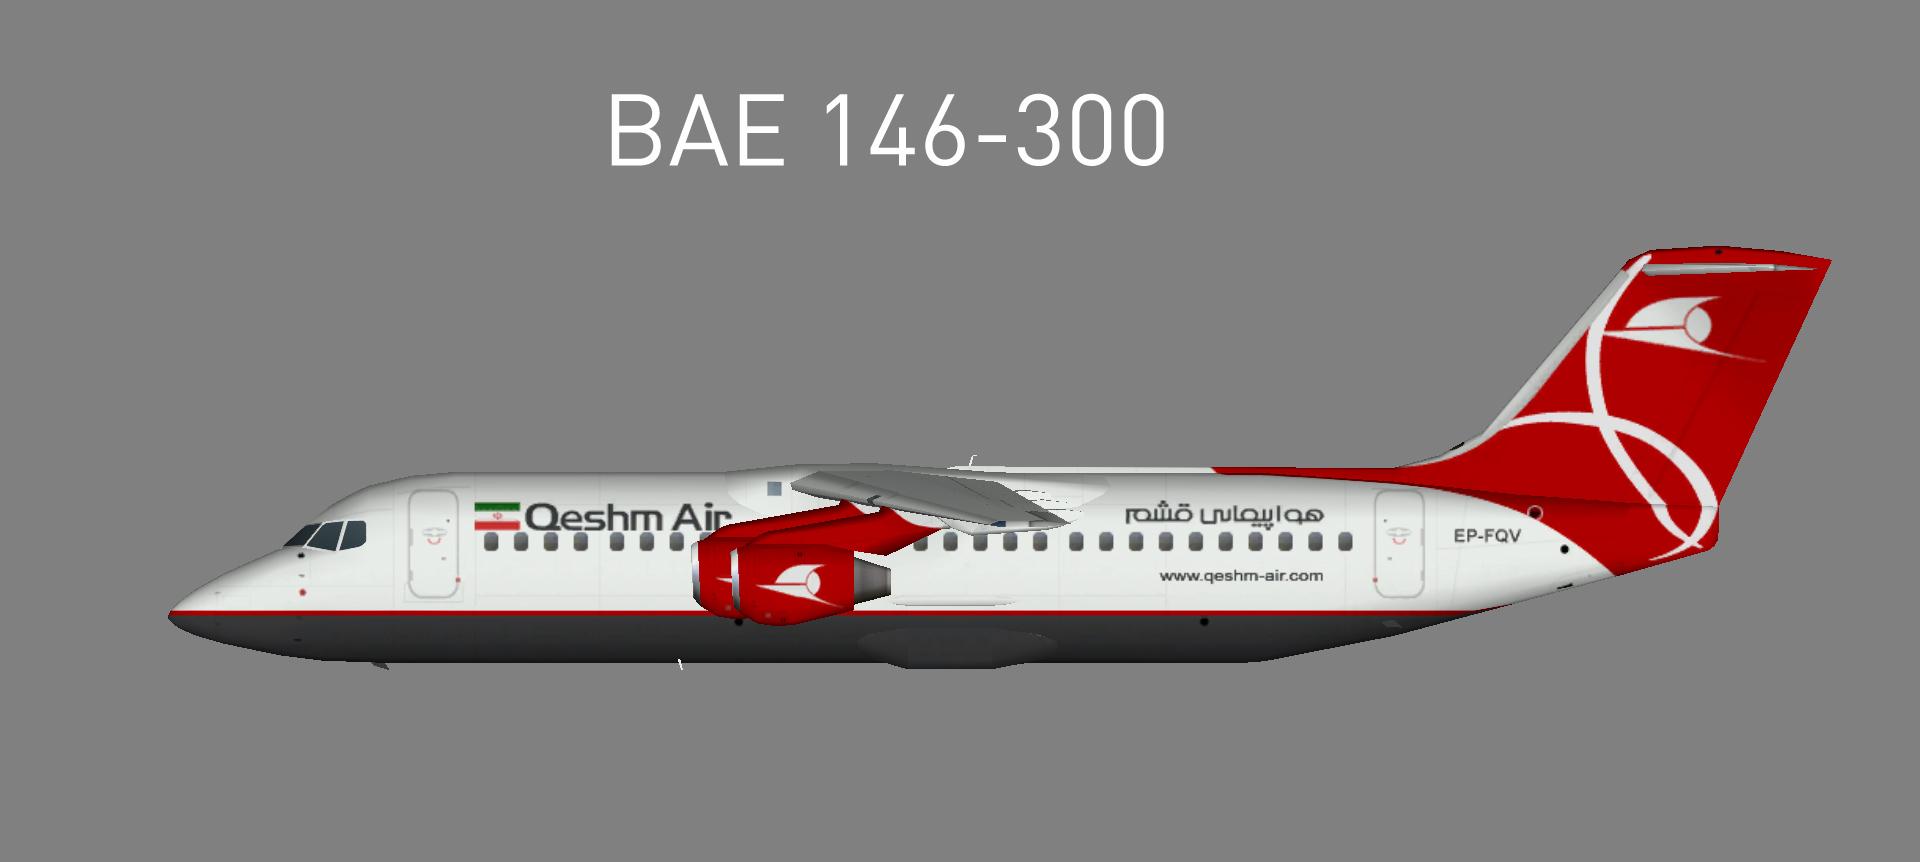 Qeshm Air BAE 146-300